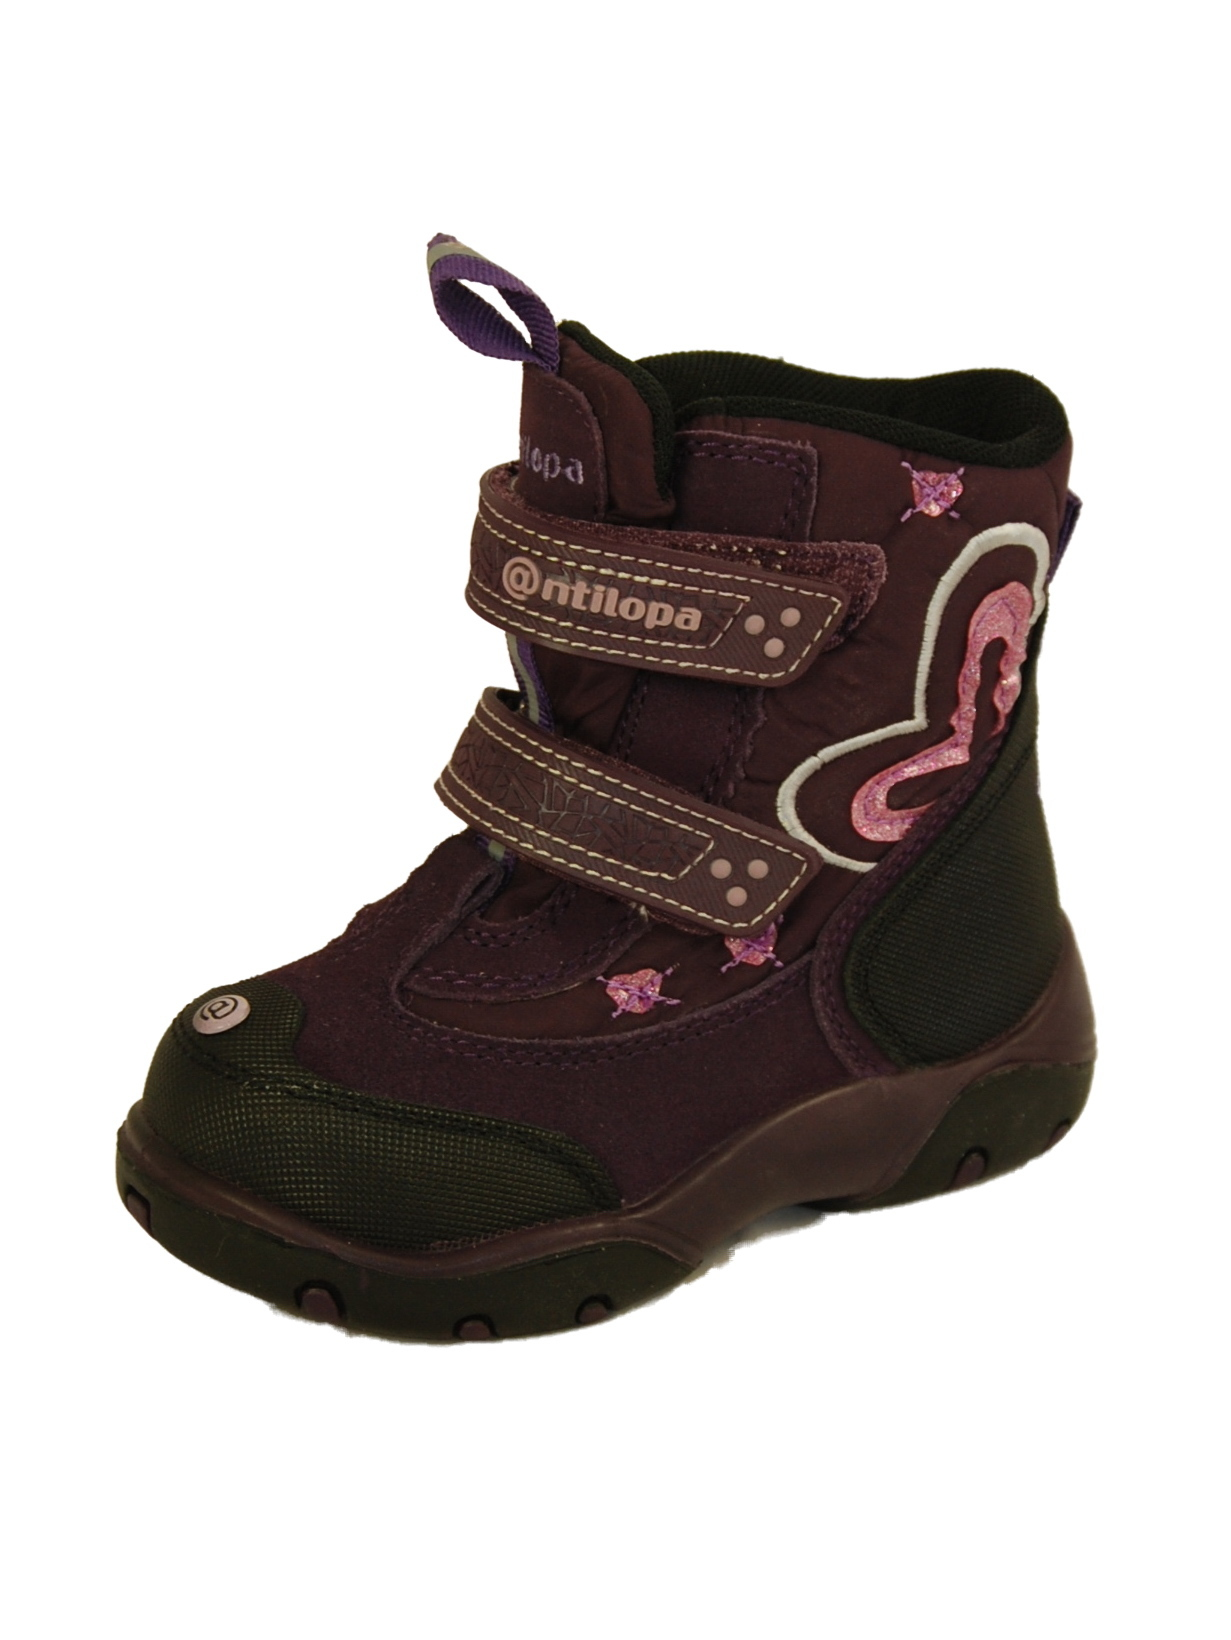 58d253d43 Магазин обуви Антилопа-мембранная обувь-сапоги Антилопа 23162-2514